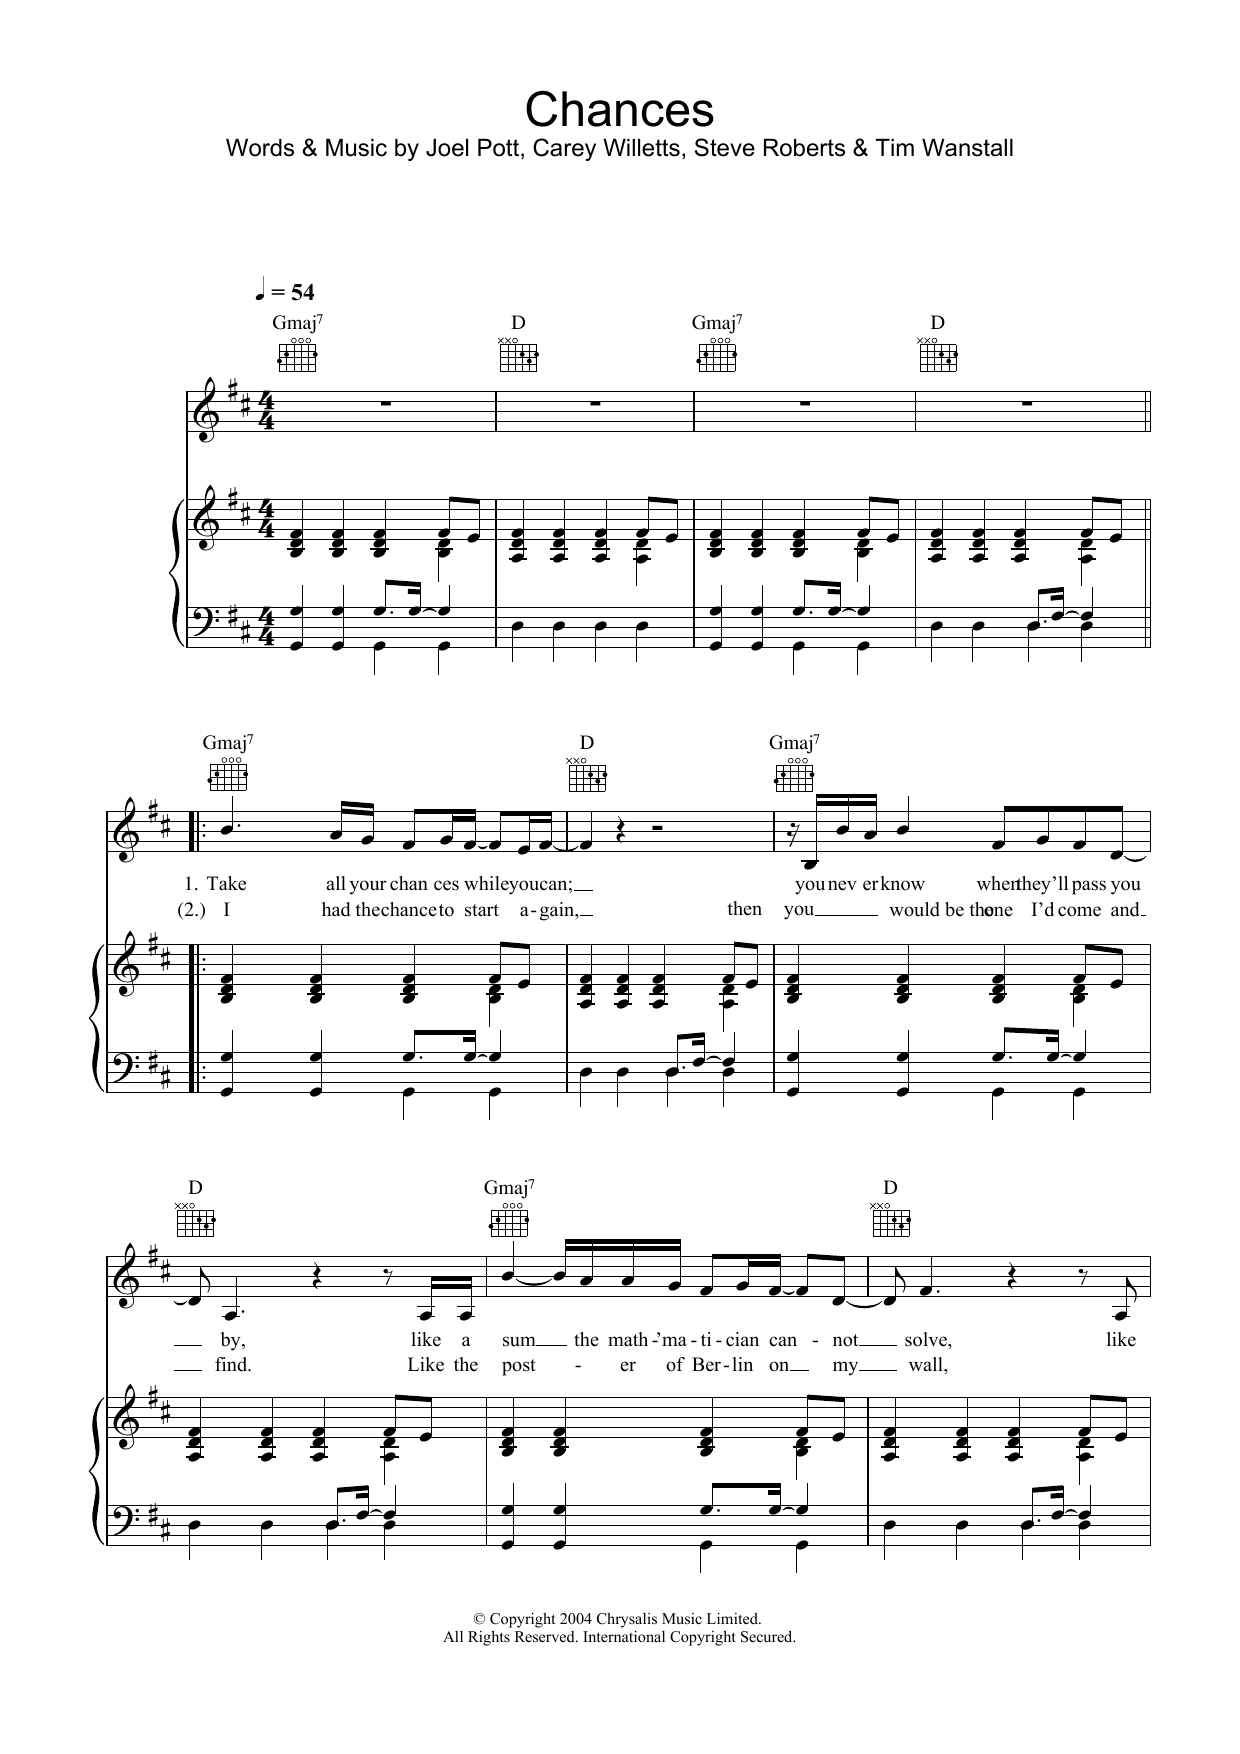 Chances Sheet Music